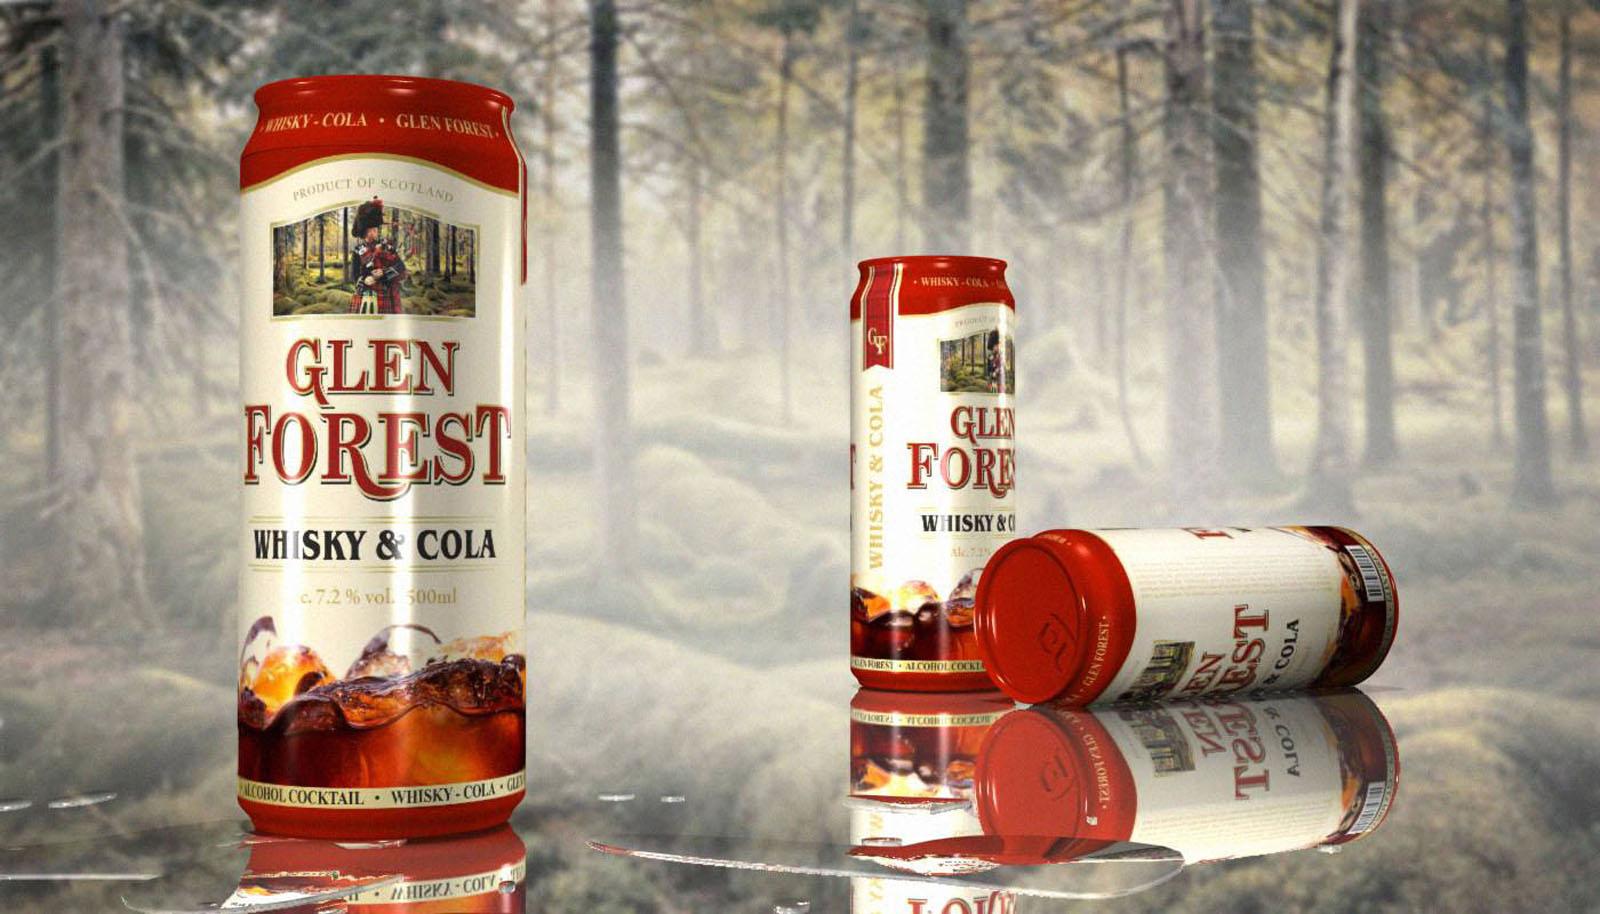 Glen Forest. Разработка дизайна на заказ для виски колы коктейля